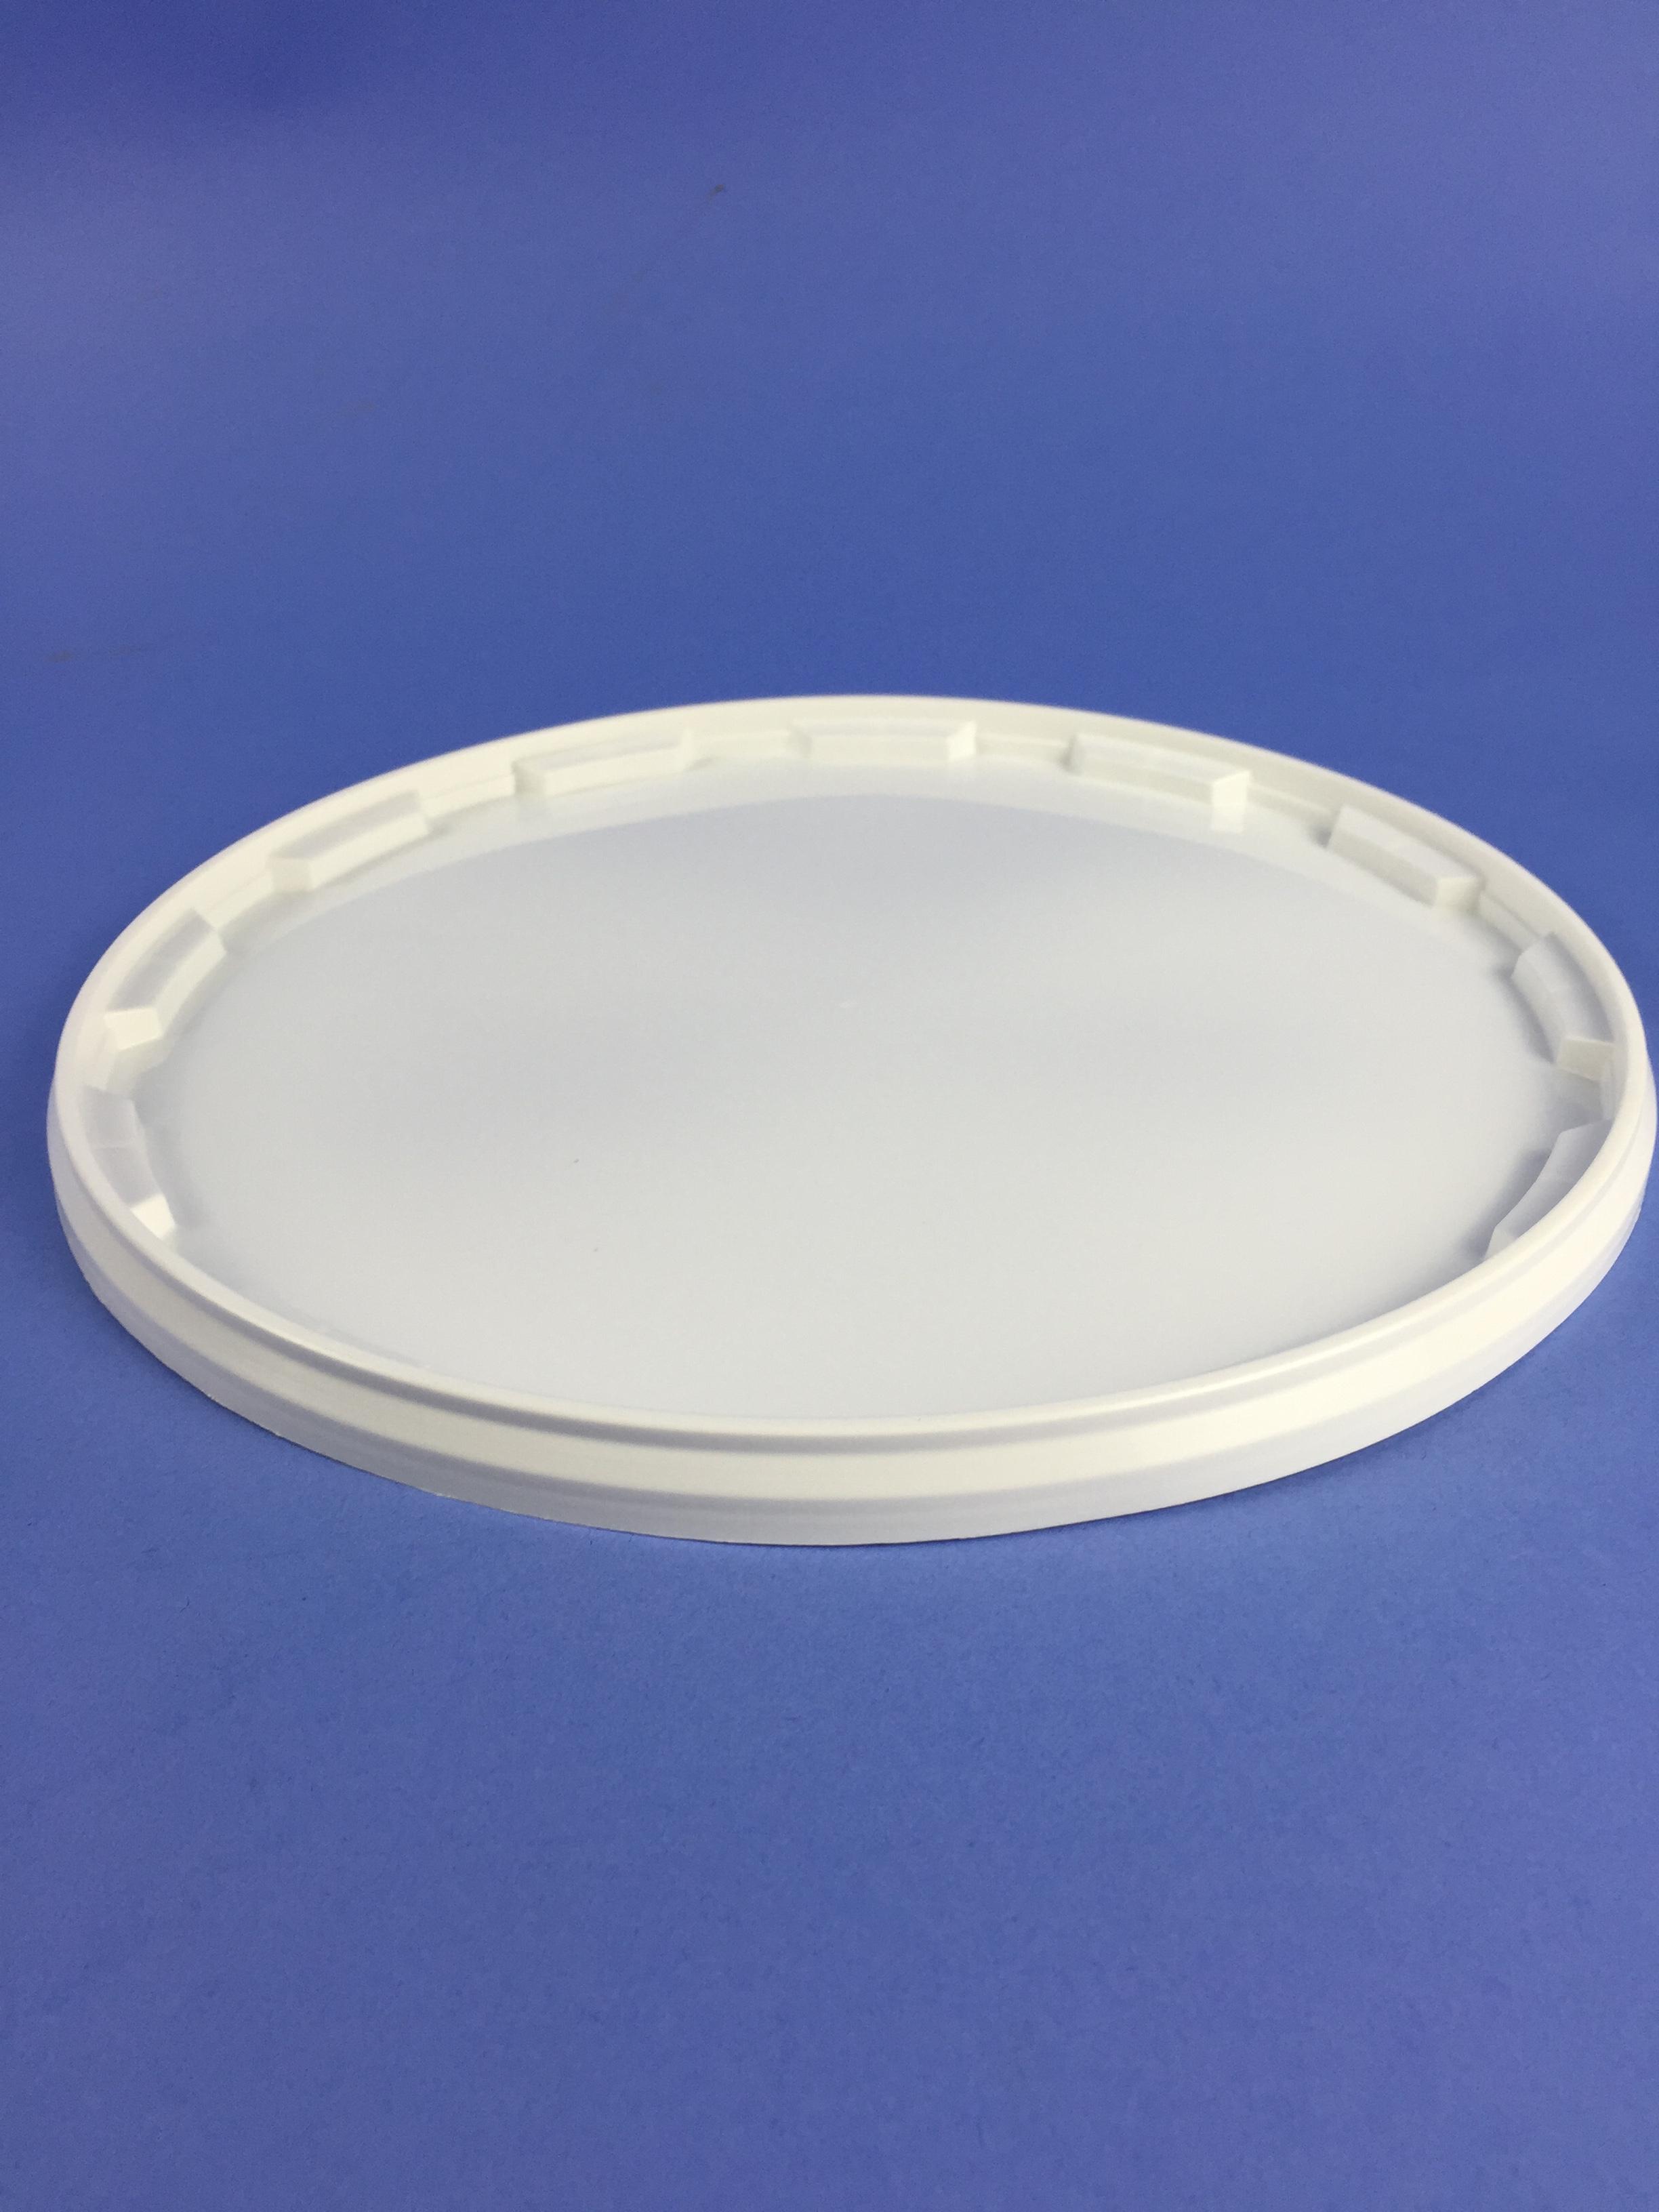 White 11 Litre Bucket C W Plastic Handle Amp Tamper Evident